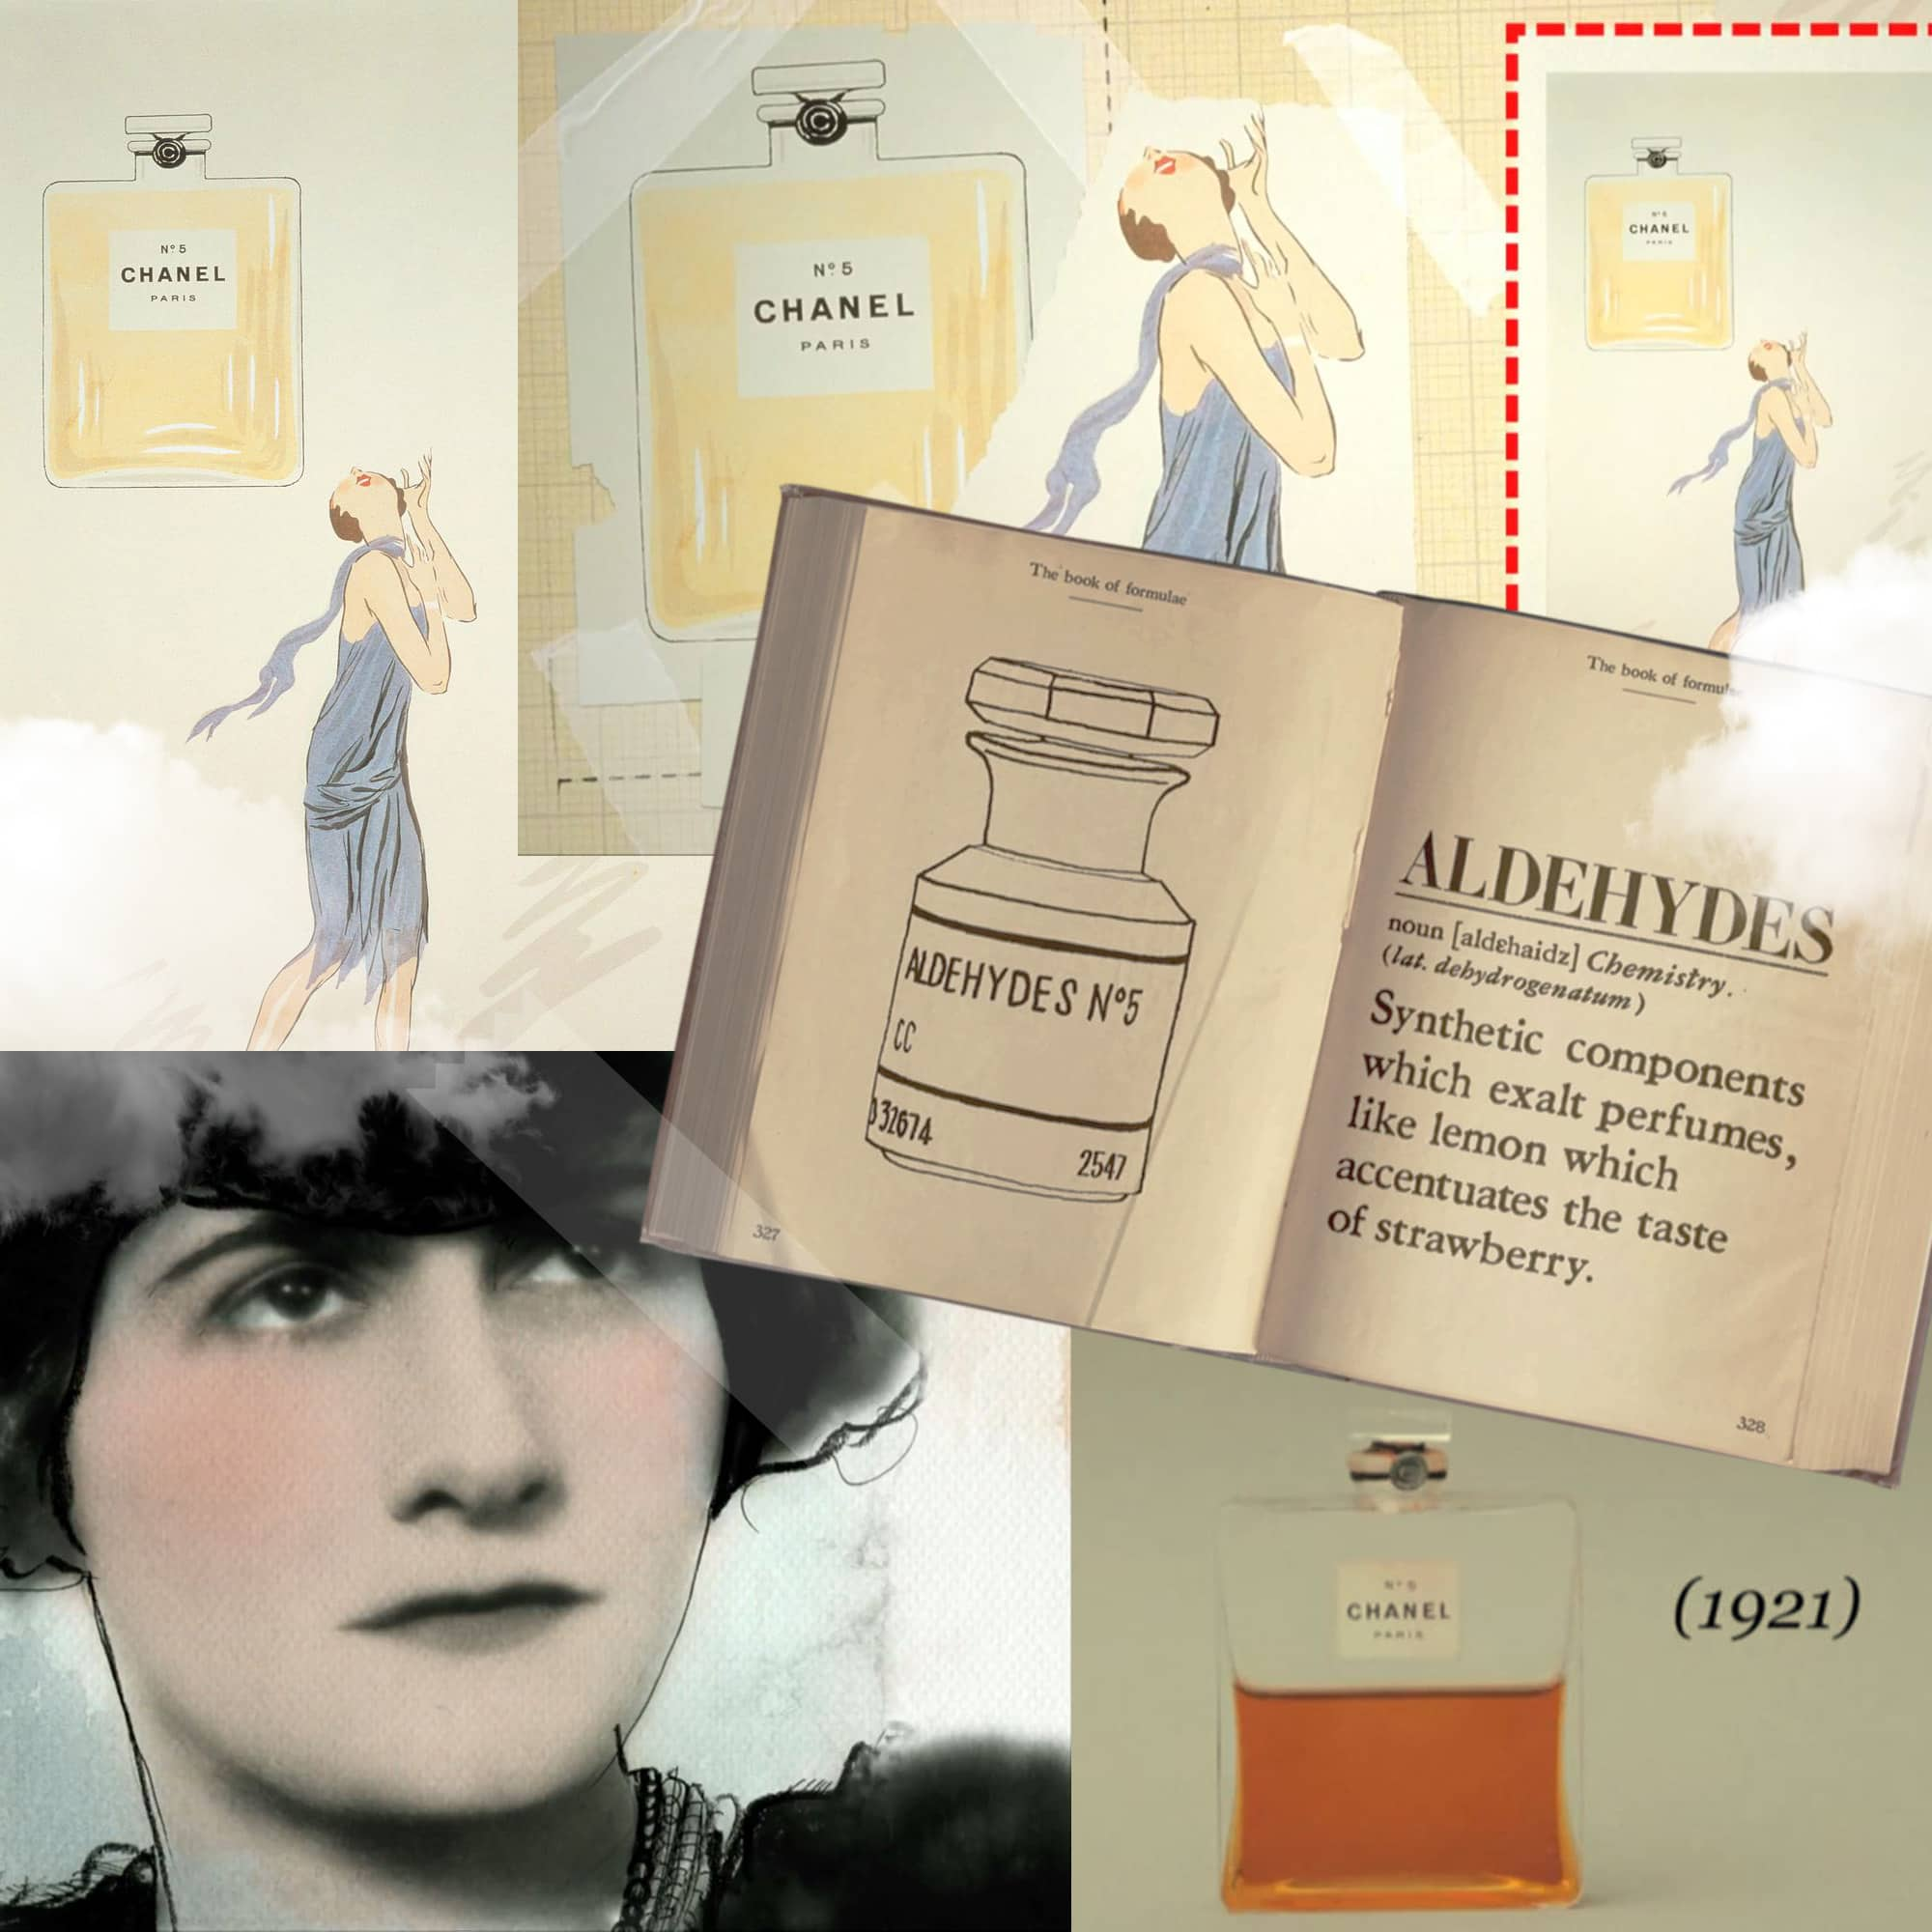 CHANEL 5 perfume - Tresors INPI by RUNWAY MAGAZINE